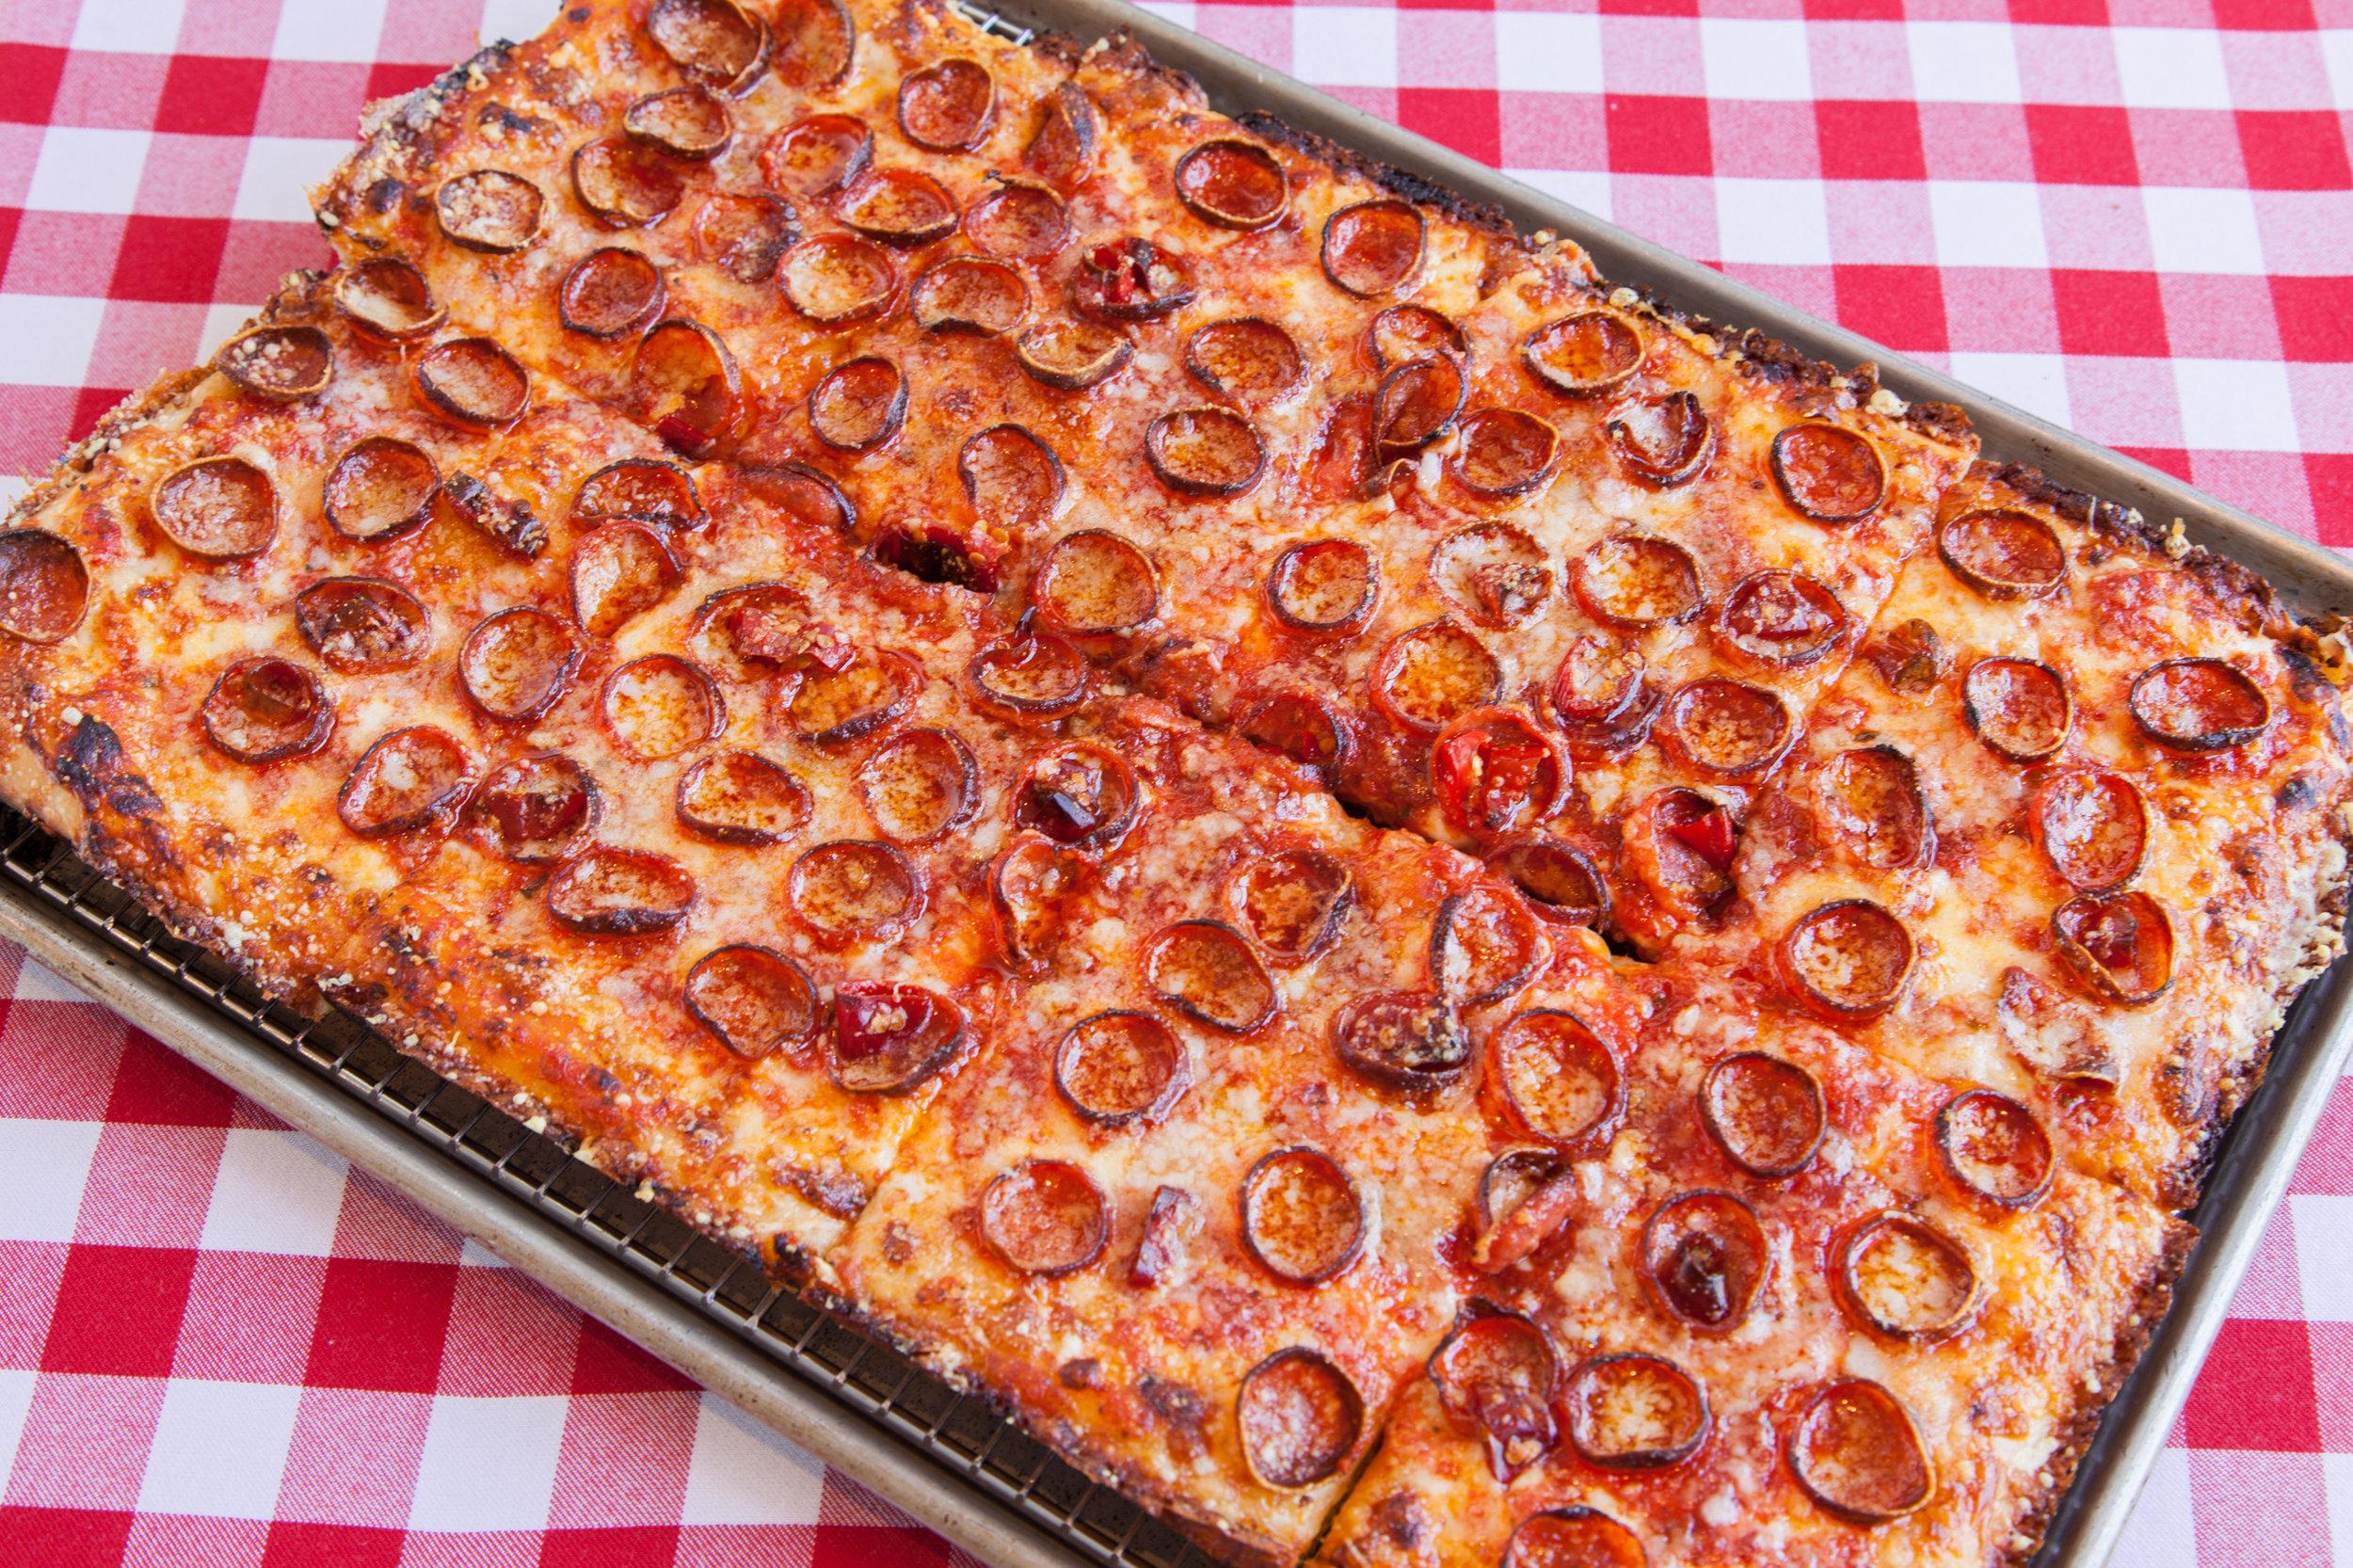 <BIG><B>PRIME PIZZA</B></BIG>